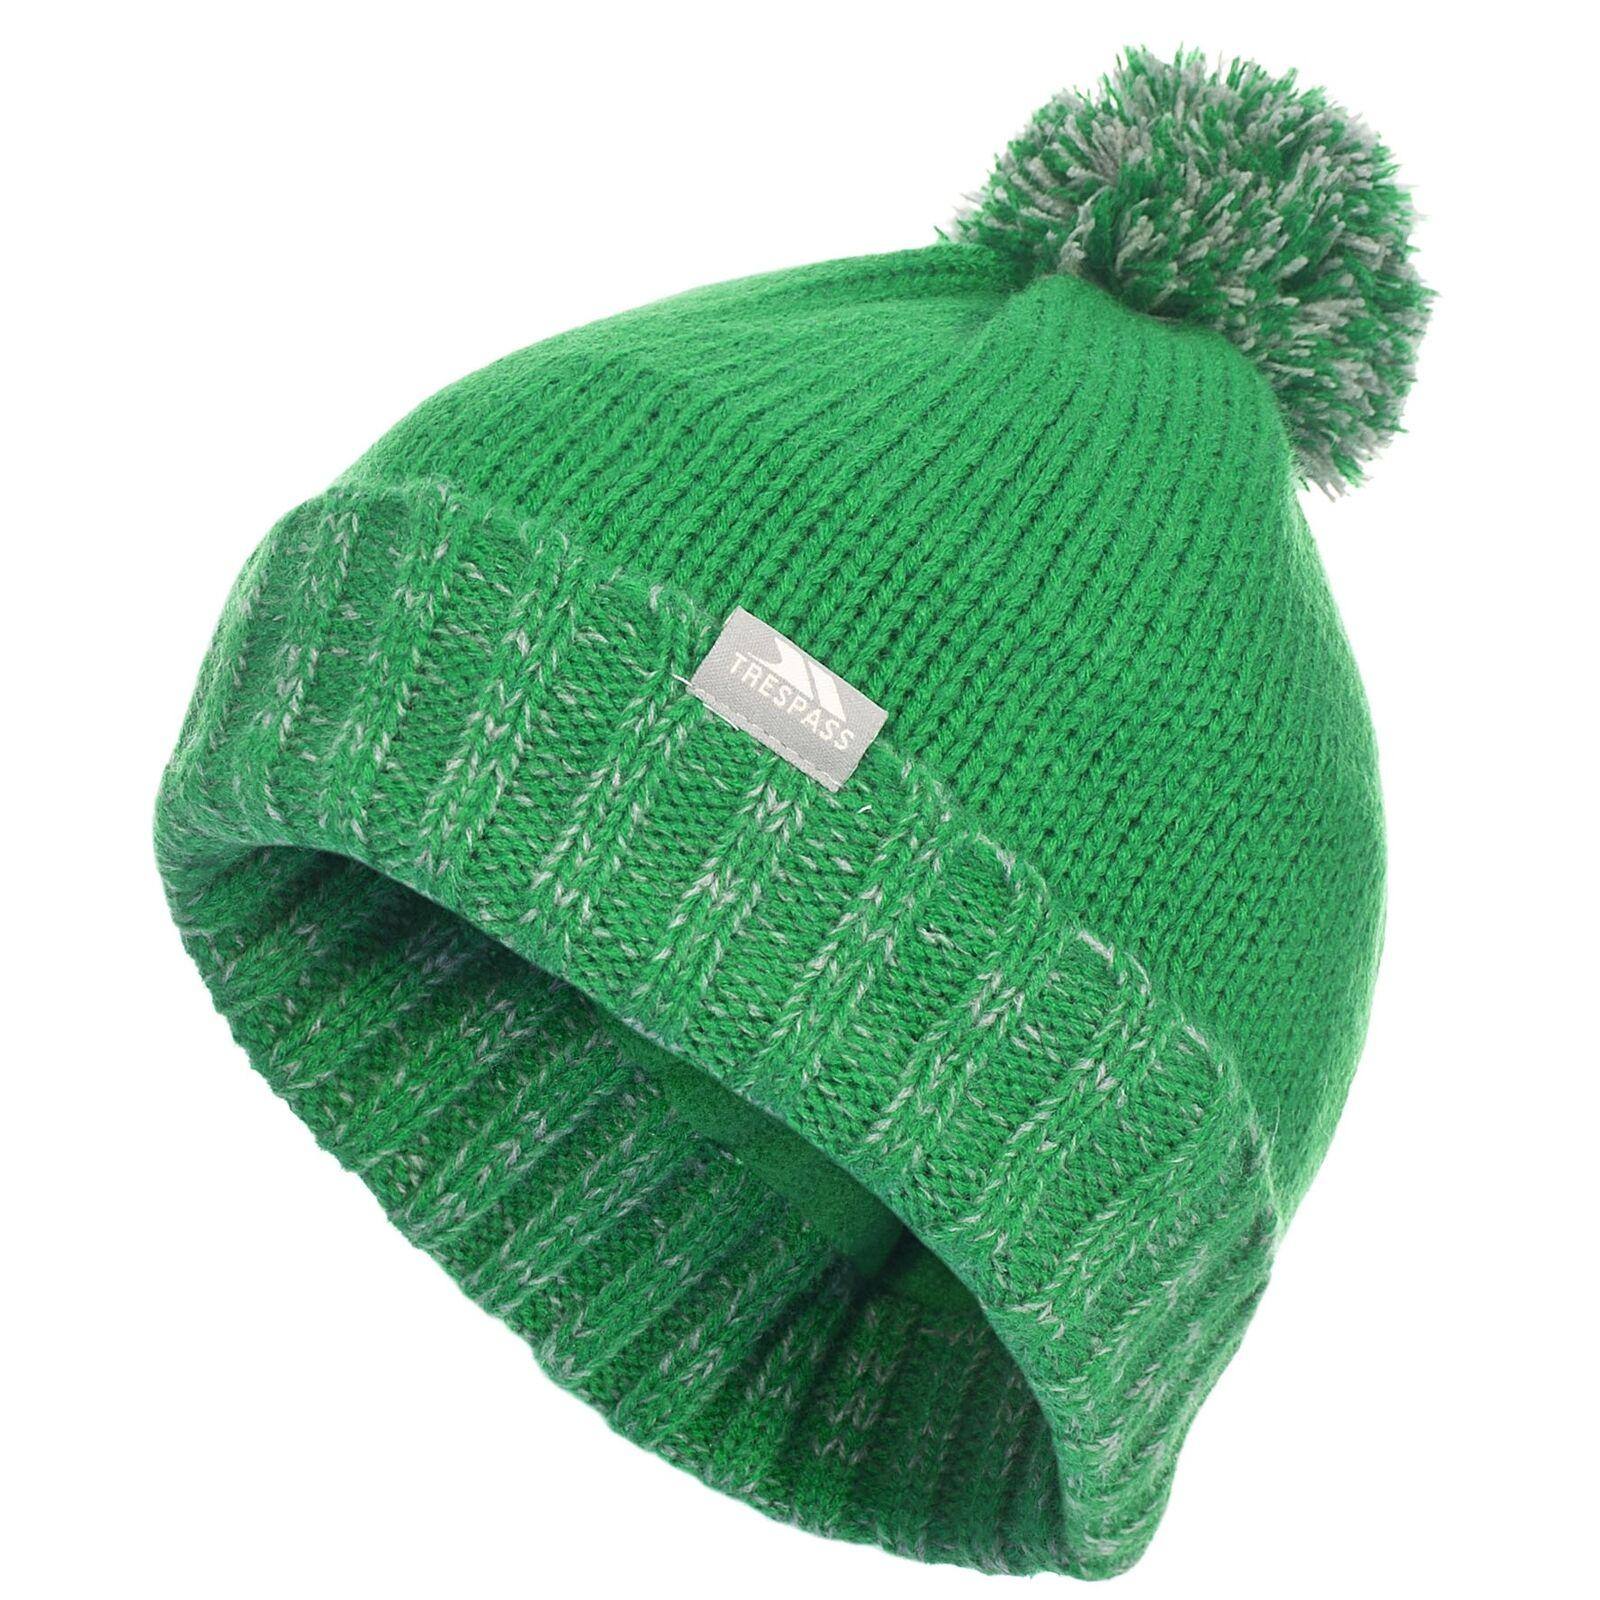 Trespass Childrens//Kids Toot Knitted Winter Beanie Hat TP2828